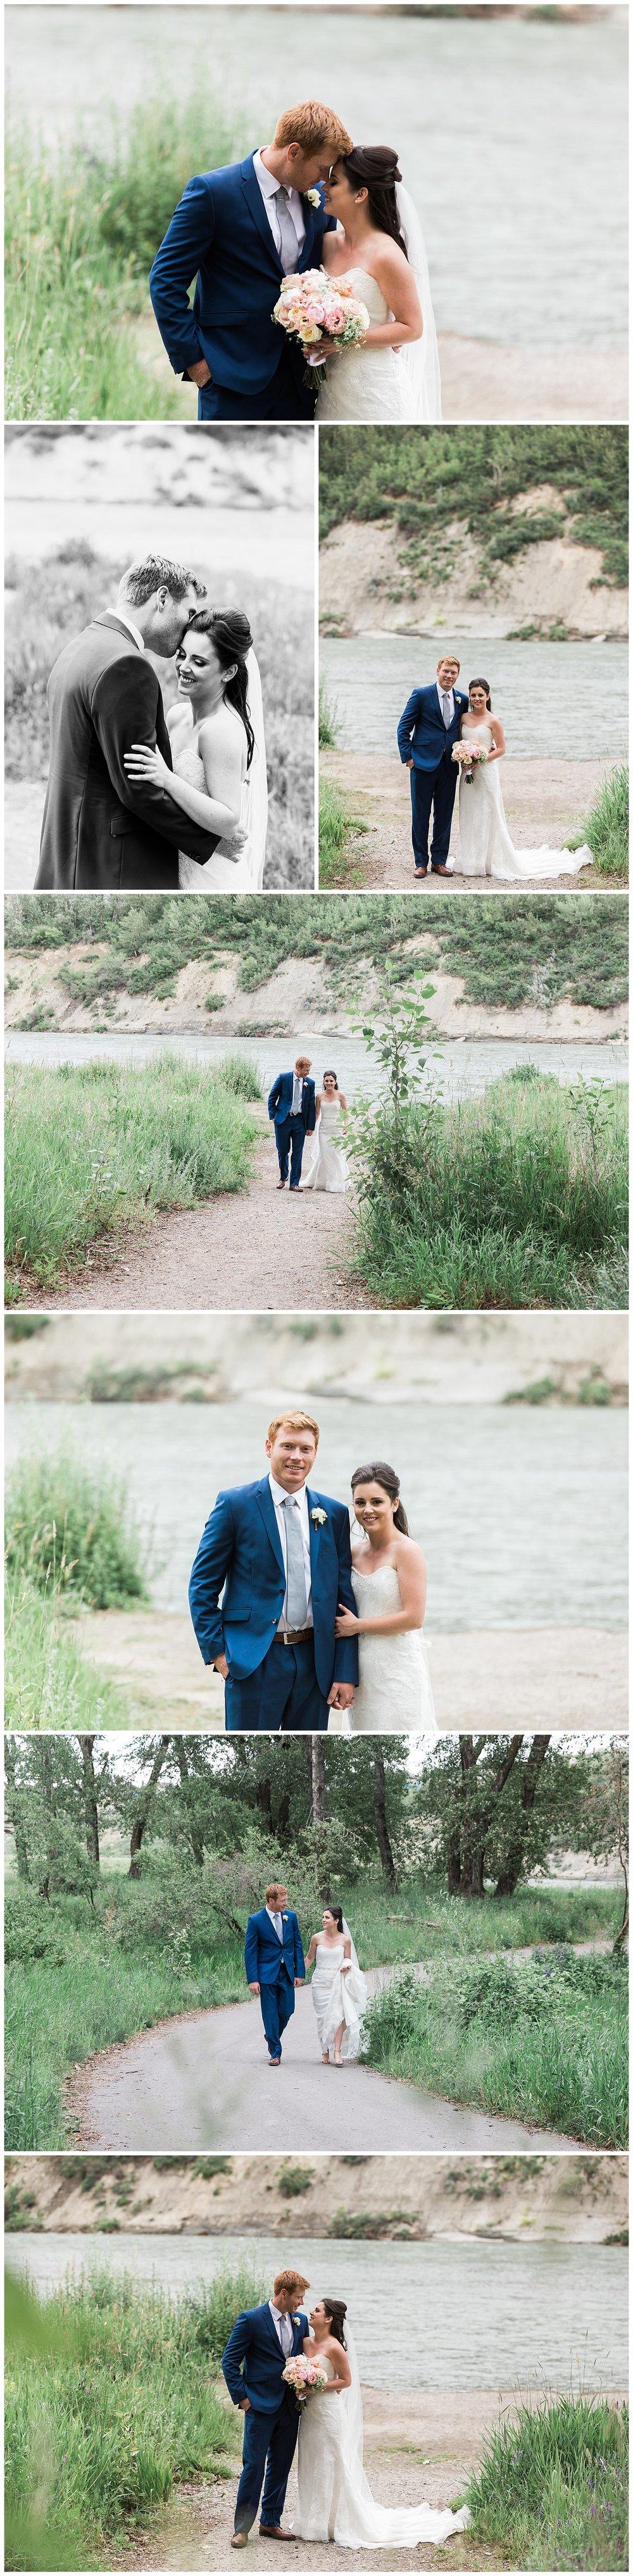 calgary-photographer-lake-house-wedding-19.jpg